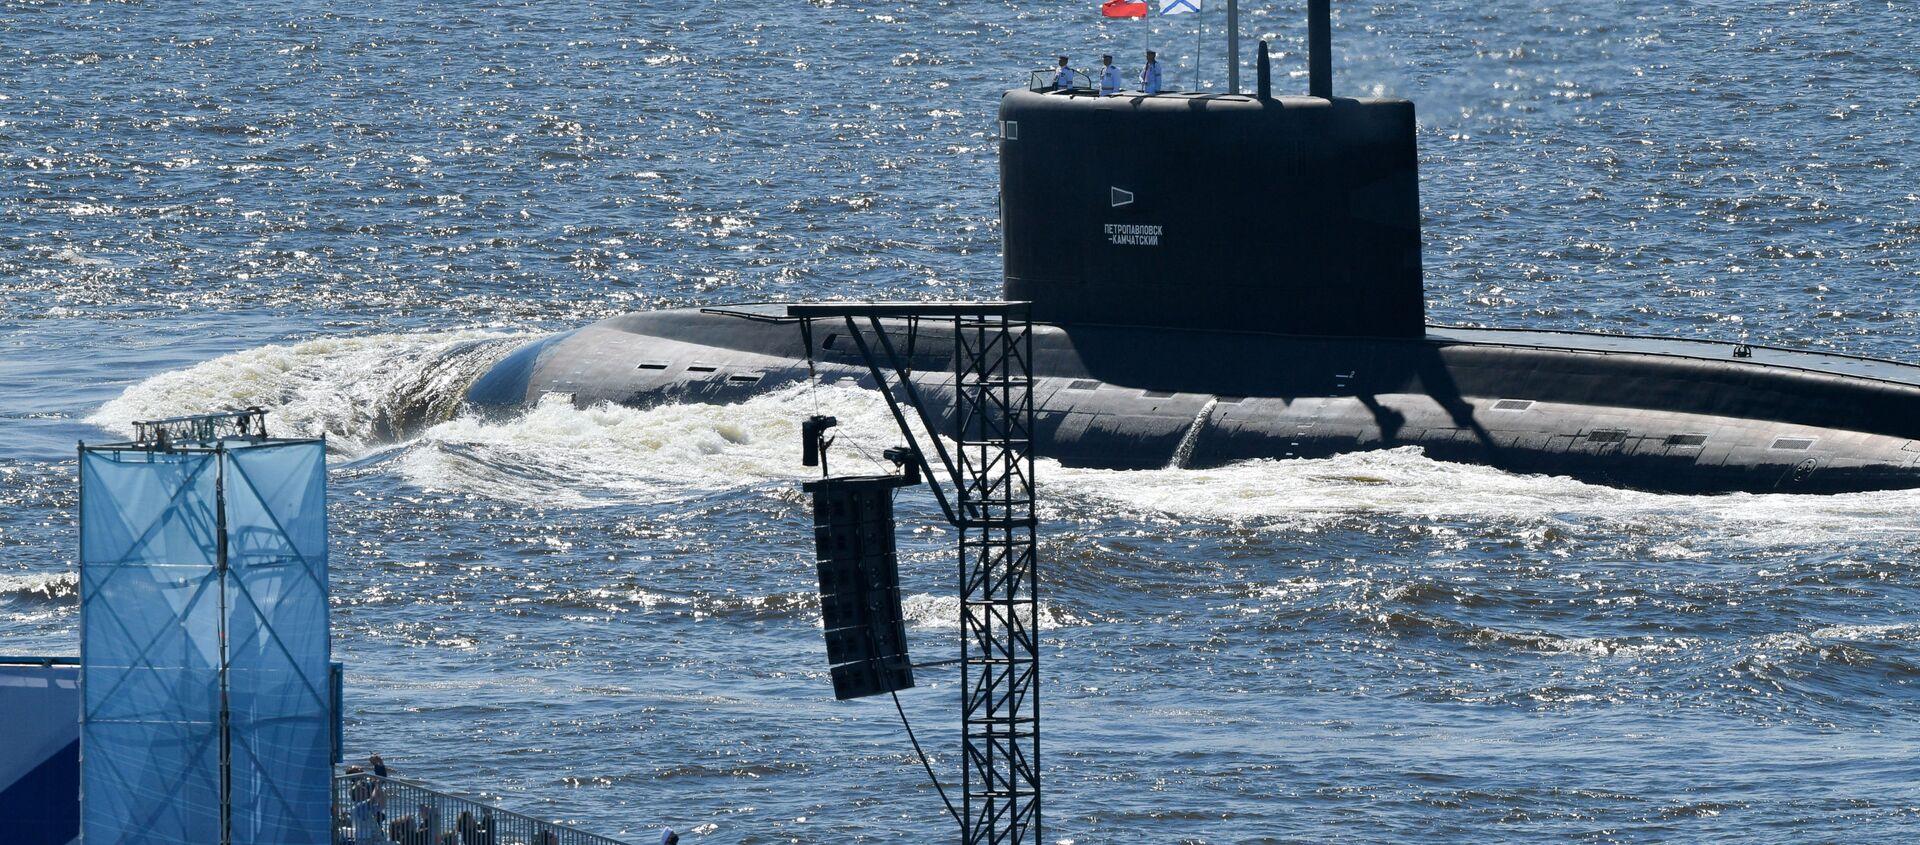 Il sottomarino Petropavlovsk-Kamchatsky - Sputnik Italia, 1920, 29.07.2020